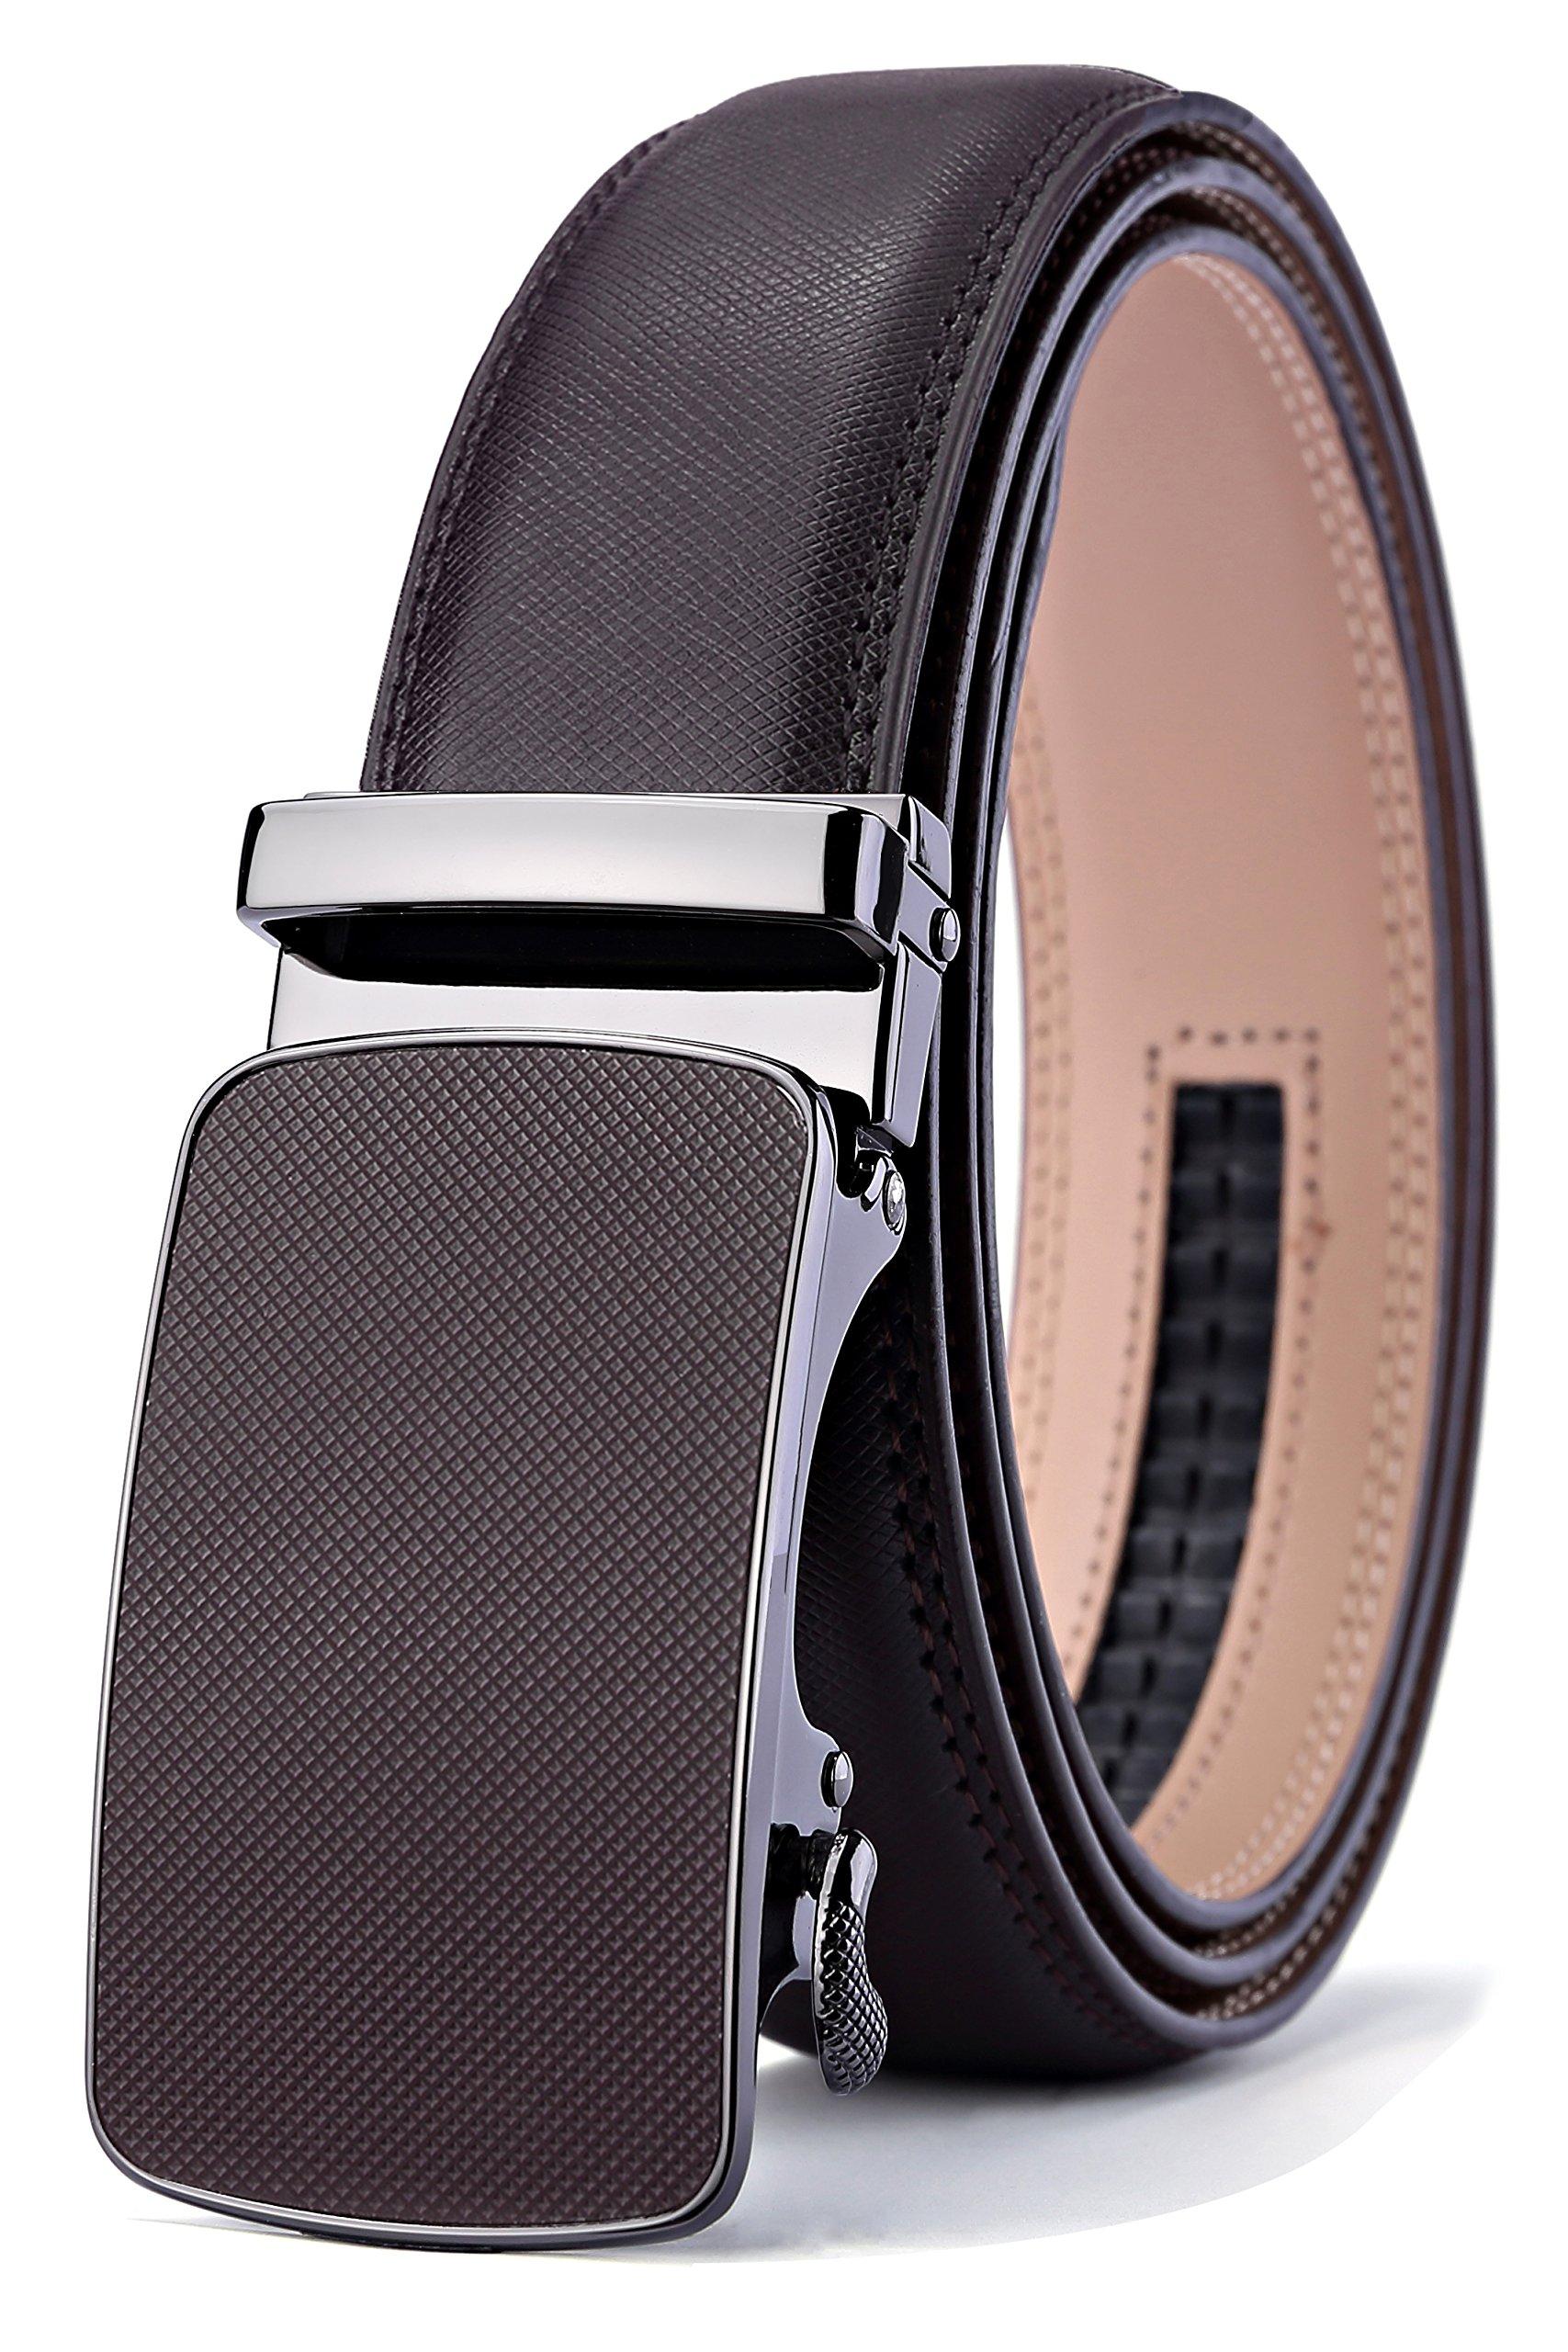 Men's Belt,Bulliant Slide Ratchet Belt for Men with Genuine Leather 1 3/8,Trim to Fit by BULLIANT (Image #1)